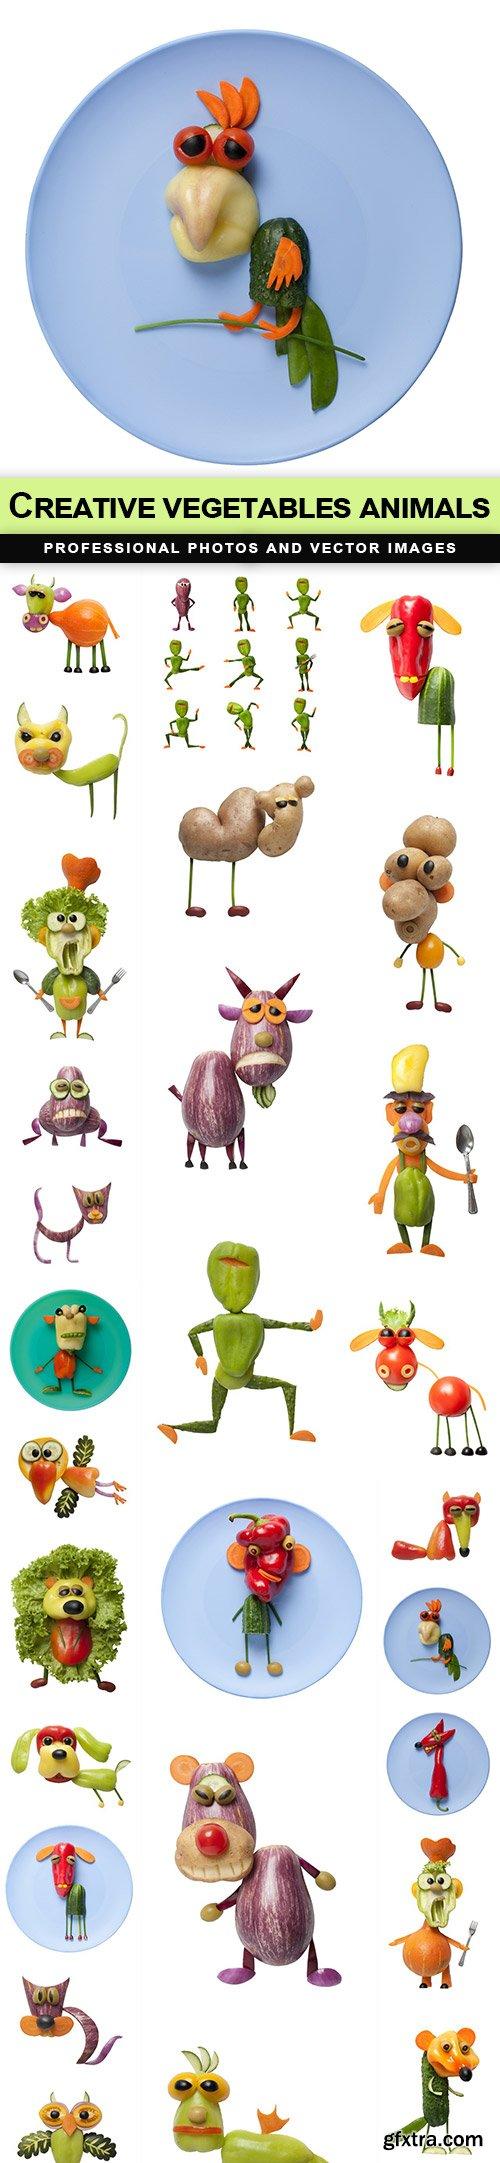 Creative vegetables animals